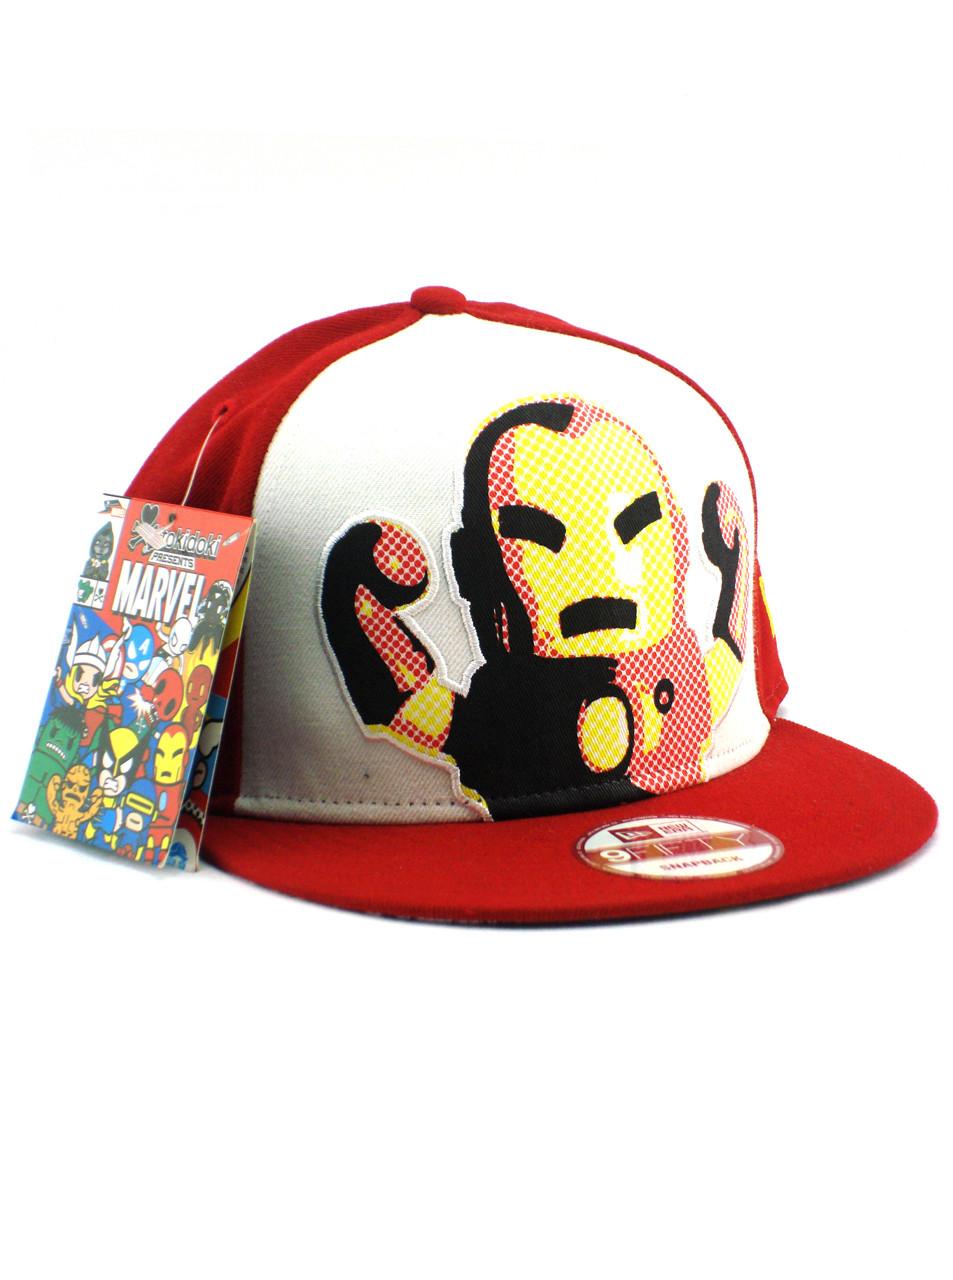 87f887ec13f New Era Tokidoki Iron Man Retro 9fifty Snapback Hat View 1